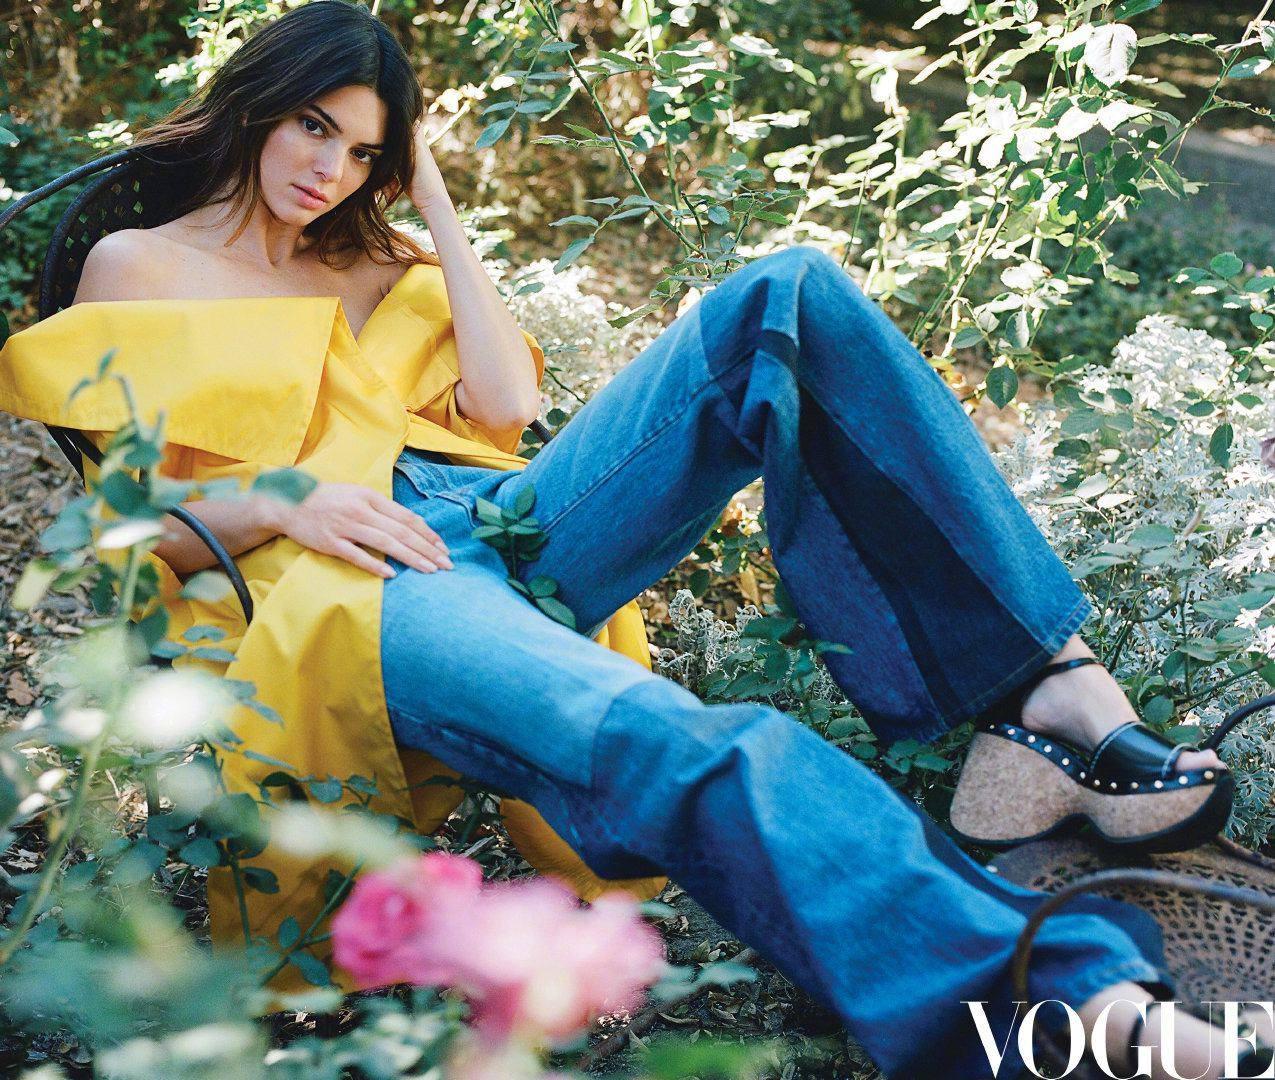 """От молодой модели до лидера стиля"": Кендалл Дженнер снялась для обложки Vogue China (ФОТО) - фото №5"